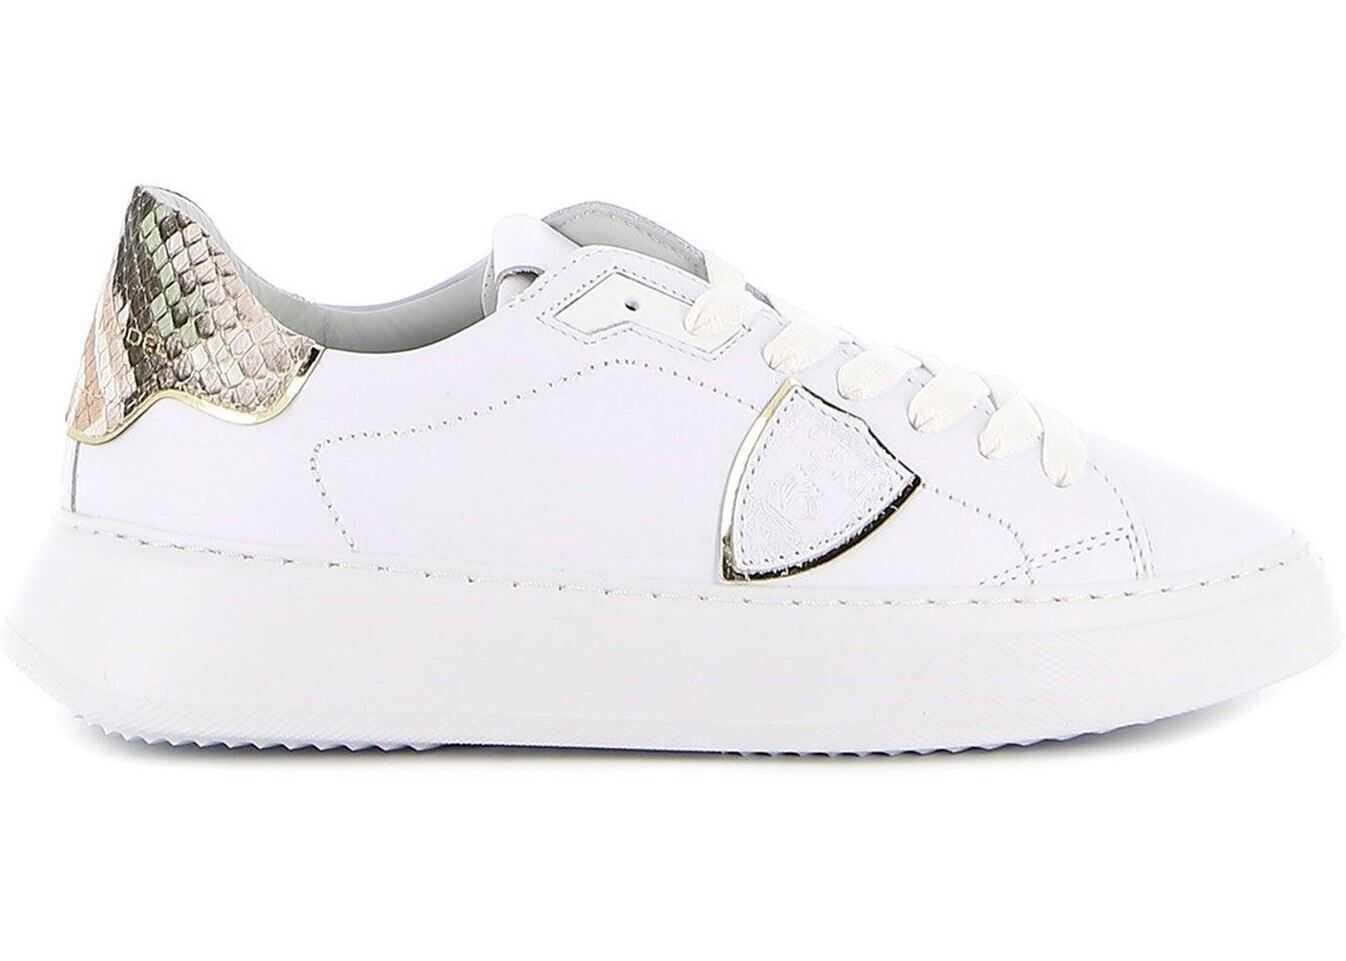 Philippe Model Temple Sneakers In White BTLDVA02 White imagine b-mall.ro